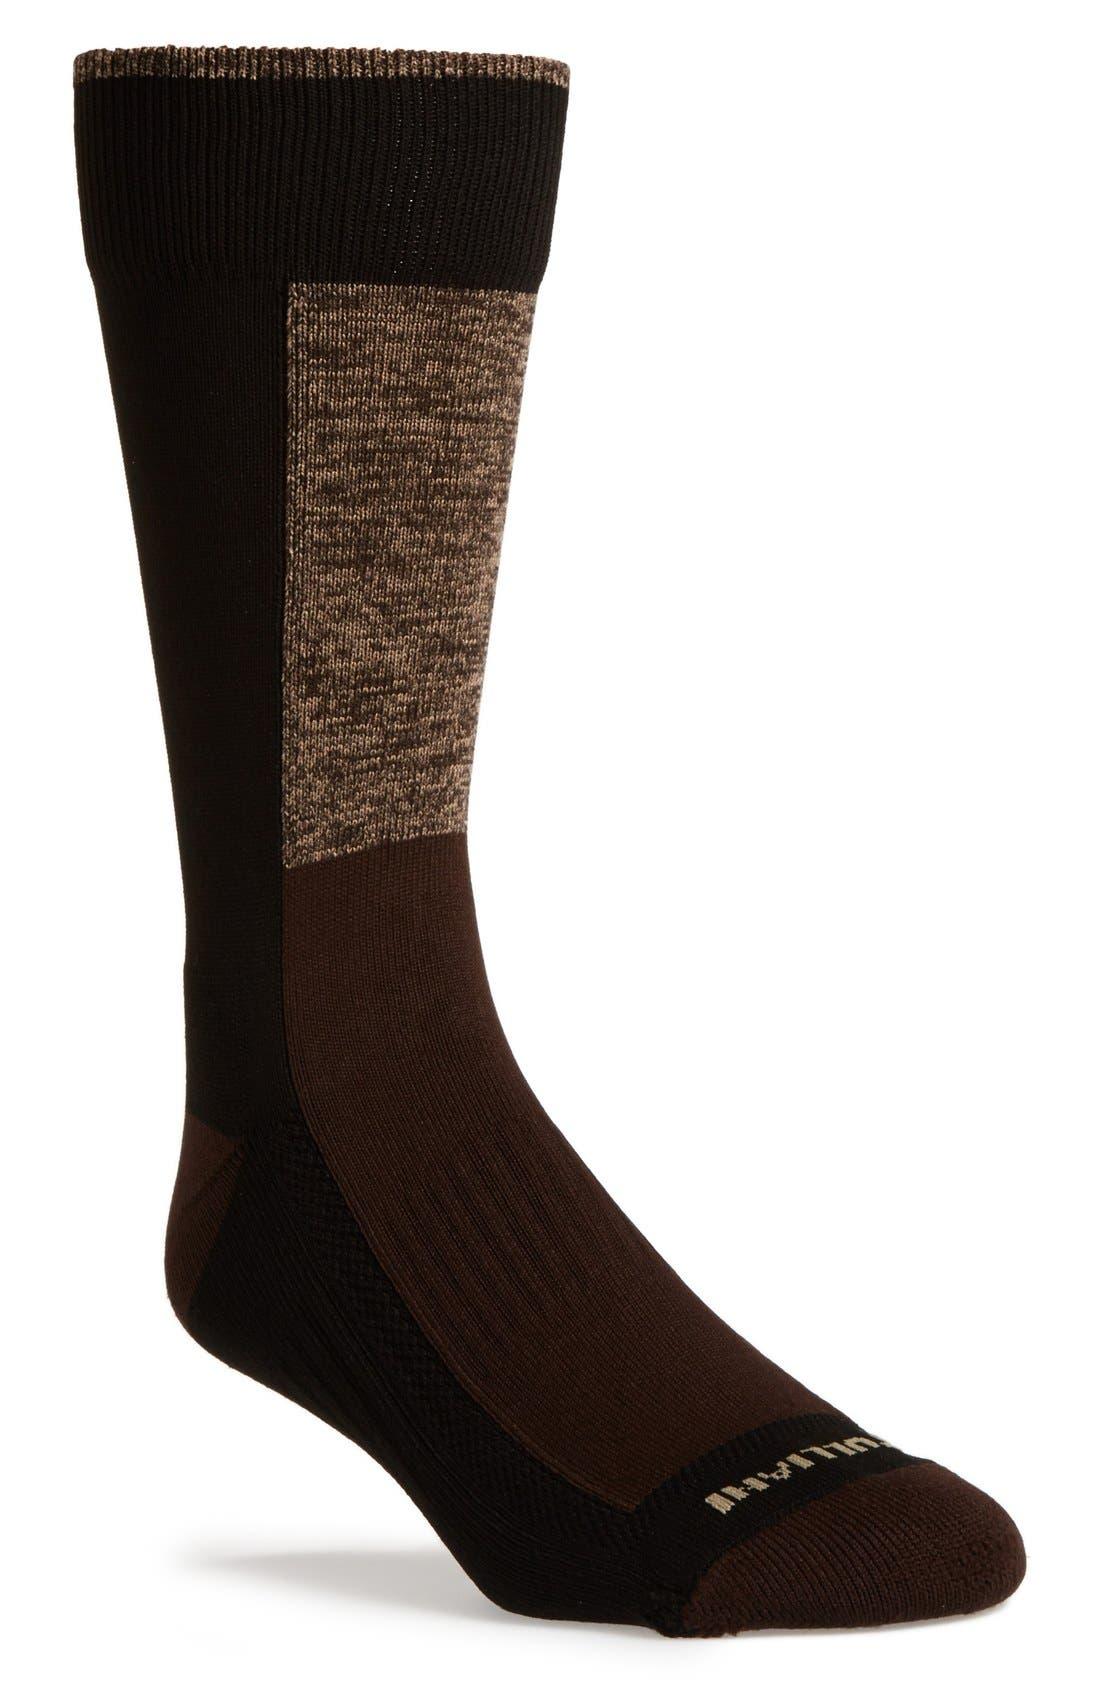 Alternate Image 1 Selected - Remo Tulliani 'Anoki' Socks